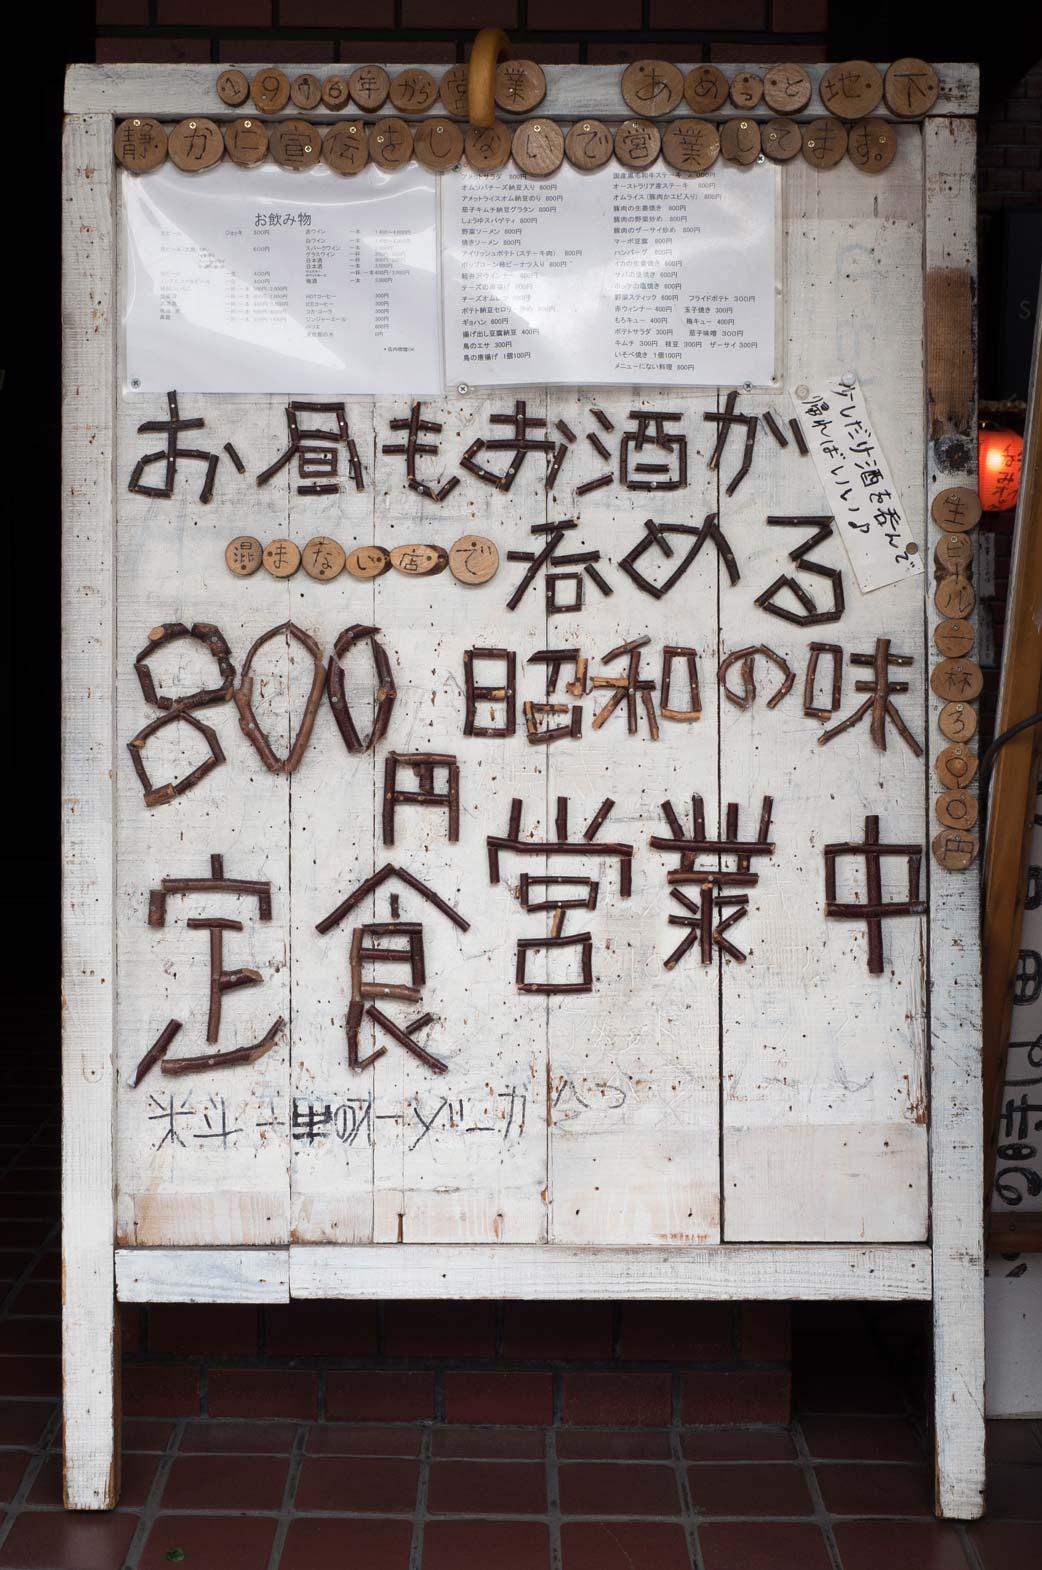 2017-09-03-jp-tokyo-roppongi-signboard-01.jpg